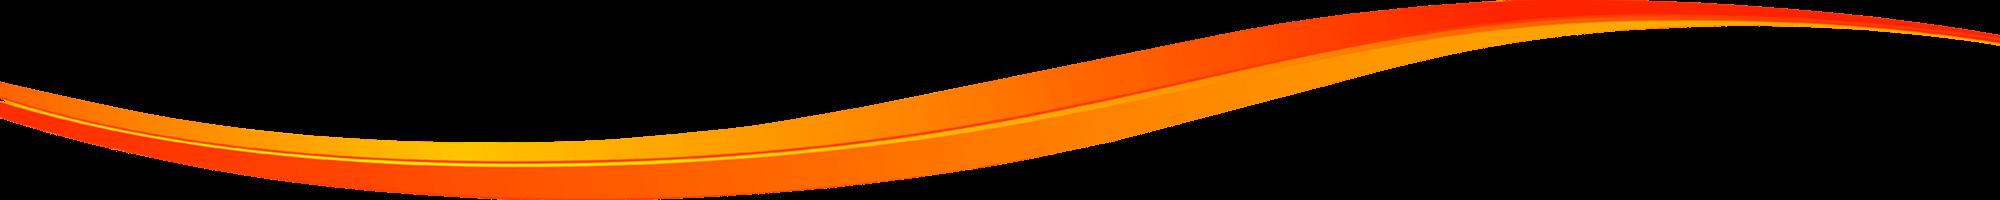 clipart-wave-divider-1